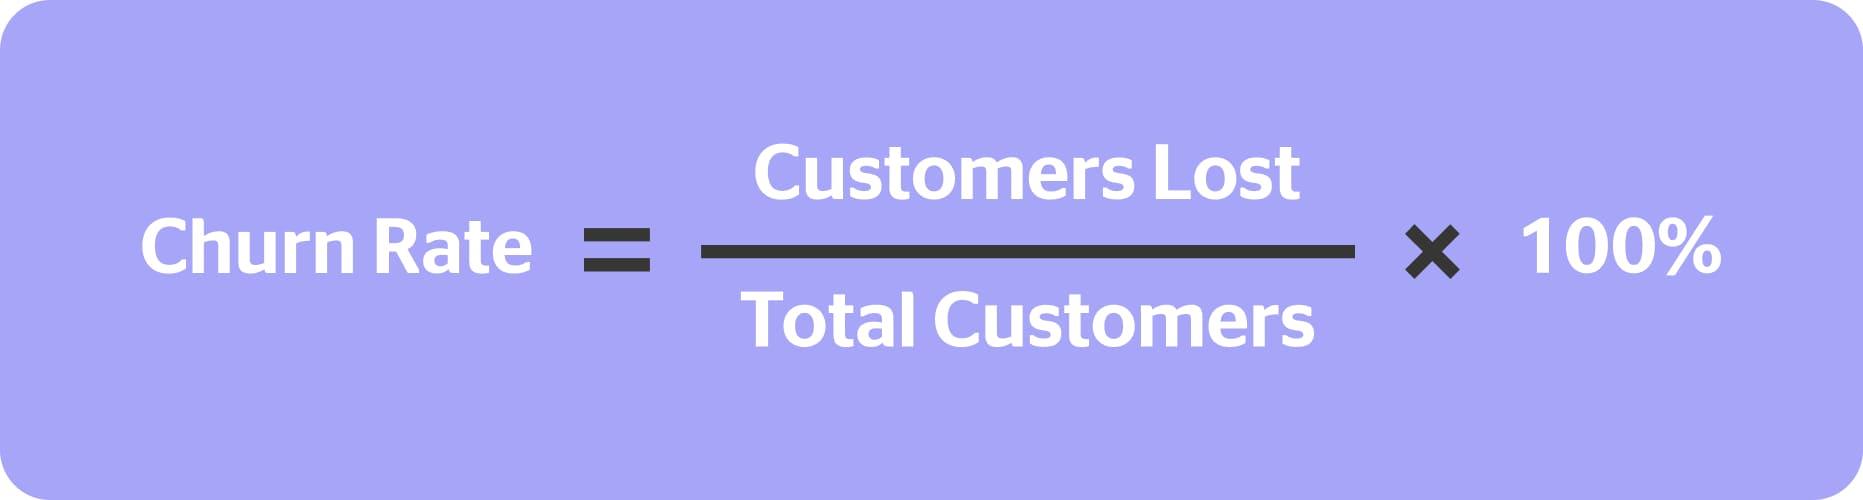 churn rate formula kpi for customer service